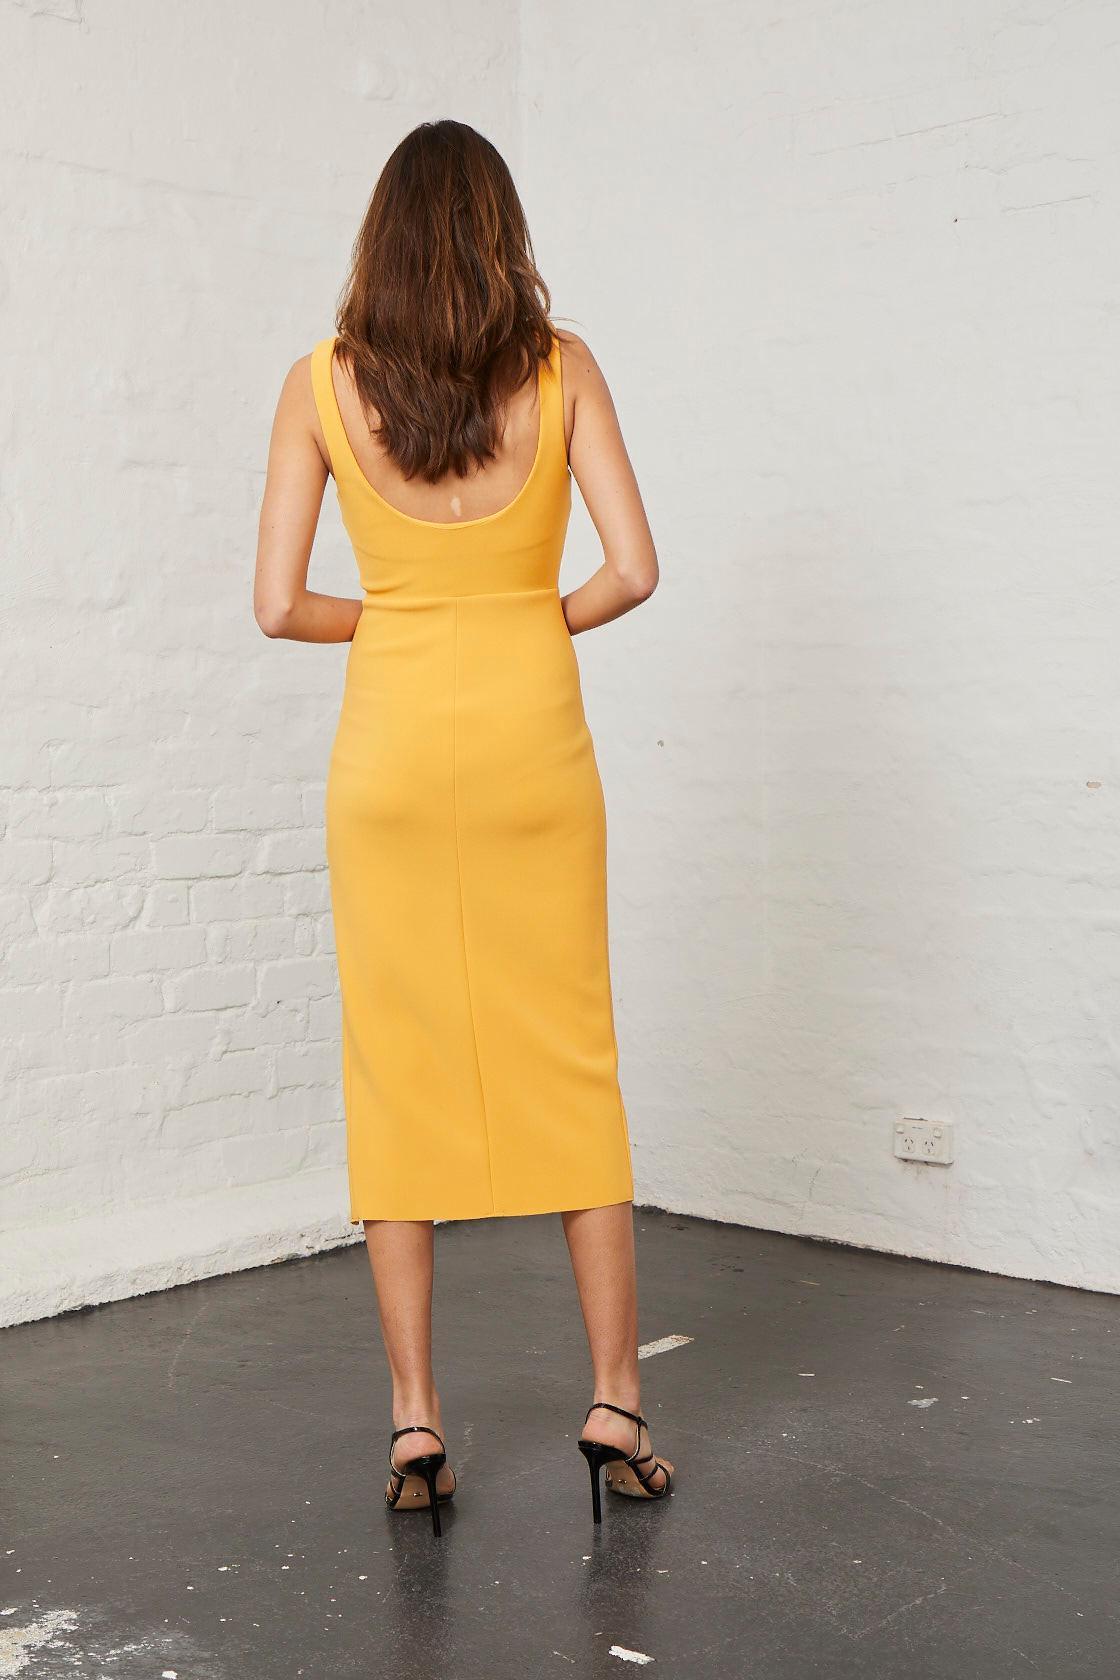 Bec & Bridge Elle Midi Dress in Mango Orange Sz 6 | The Volte